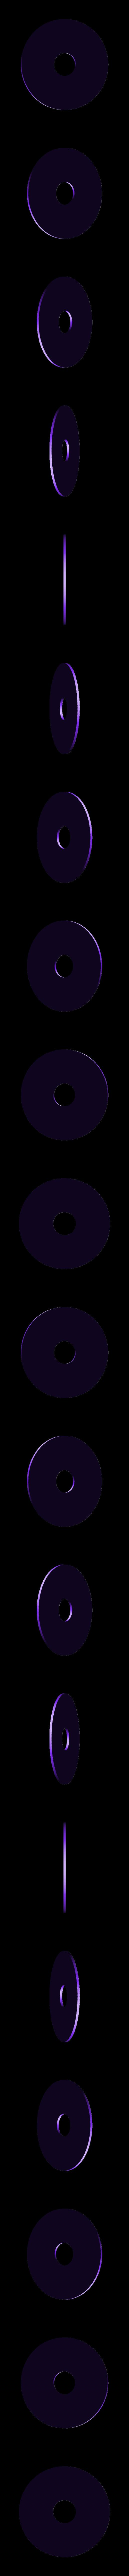 washer_32x0.8mm.stl Download free STL file PISTOL VR magnetic gunstock Oculus Rift-S Quest • 3D printer template, danielschweinert